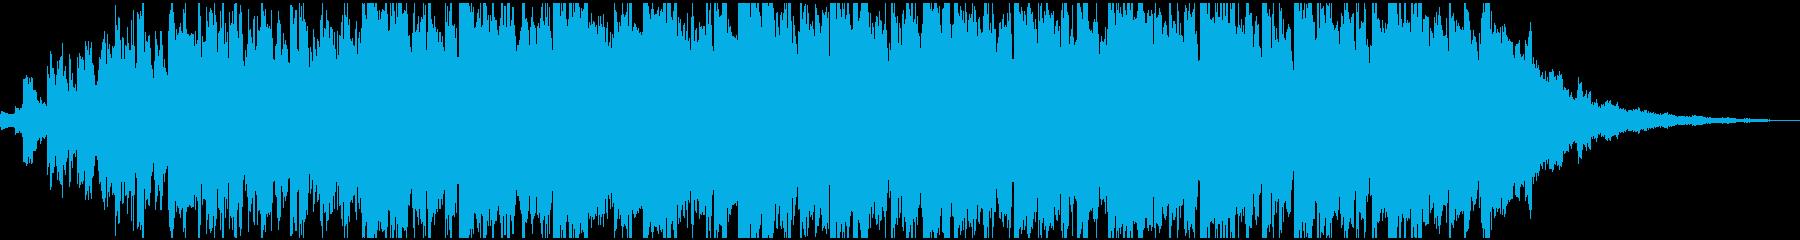 CM用短めアンビエントその2の再生済みの波形